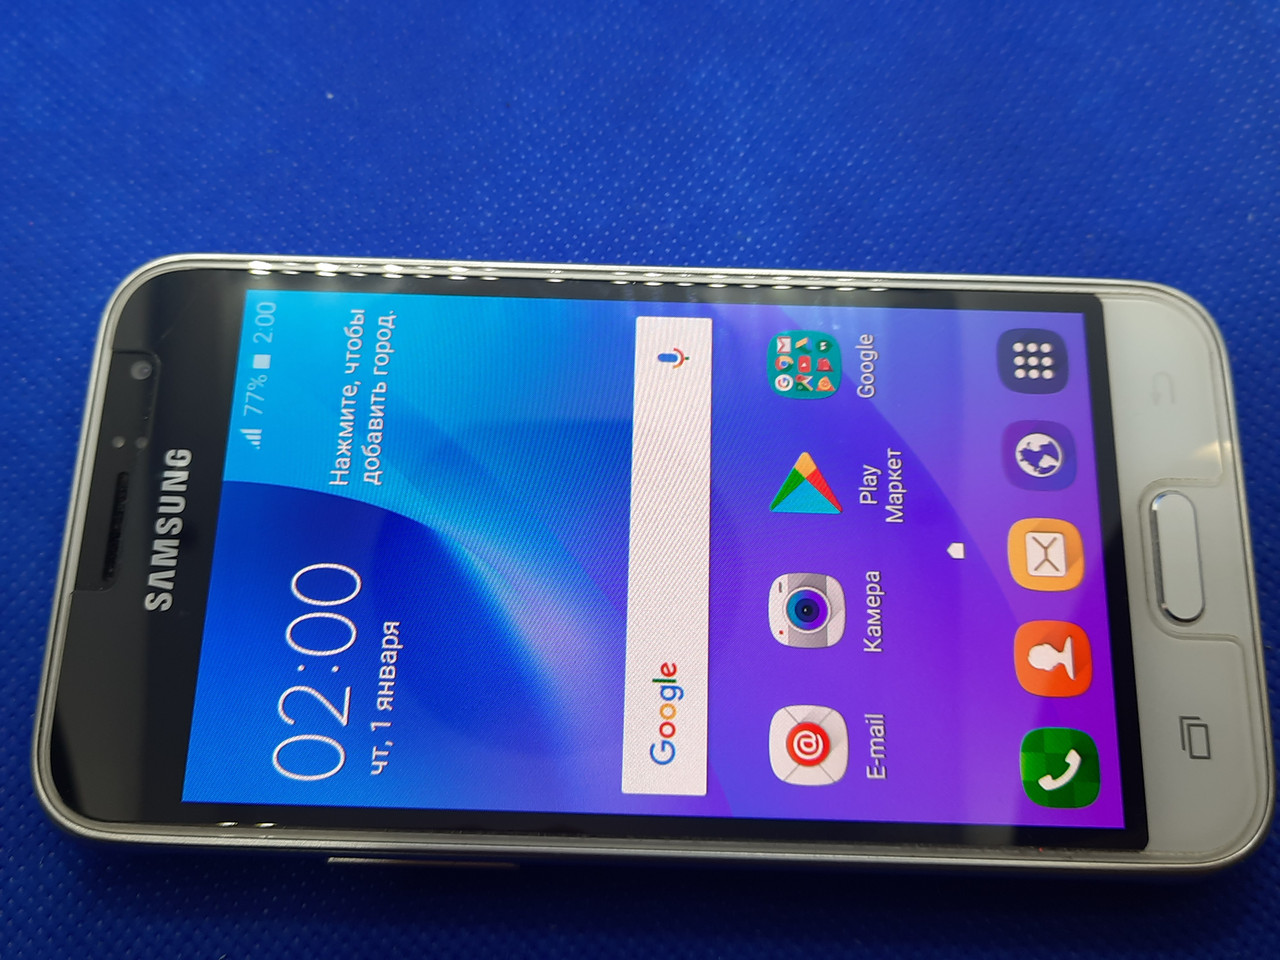 Samsung Galaxy J1 2016 SM-моделі j120 #1404ВР